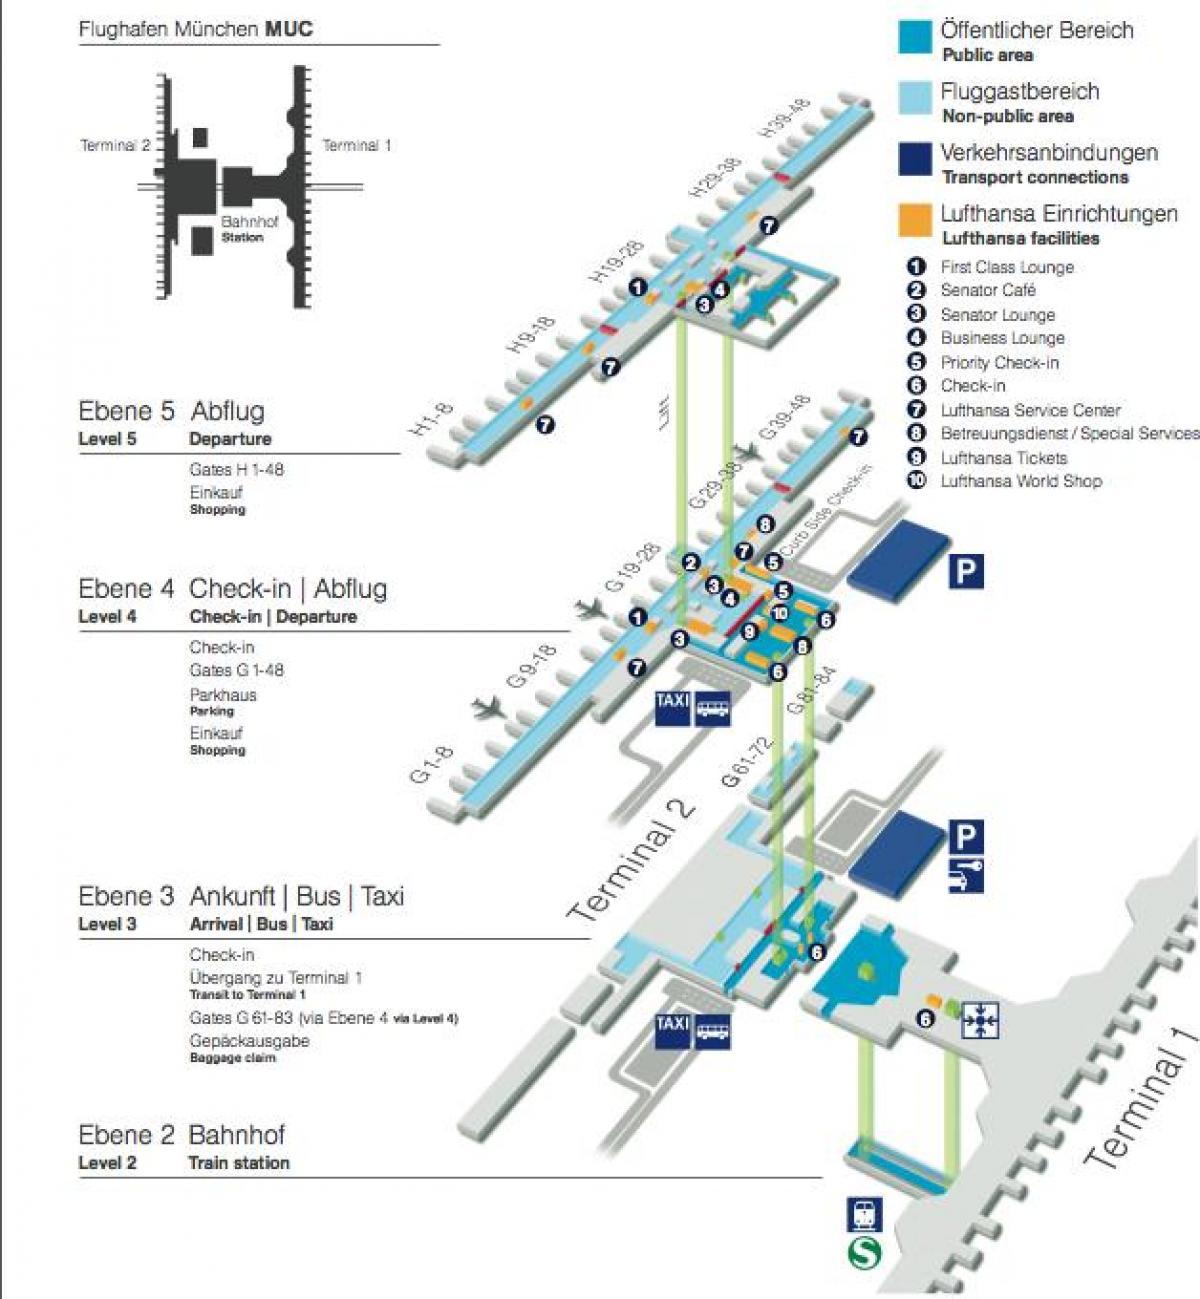 Munich airport map